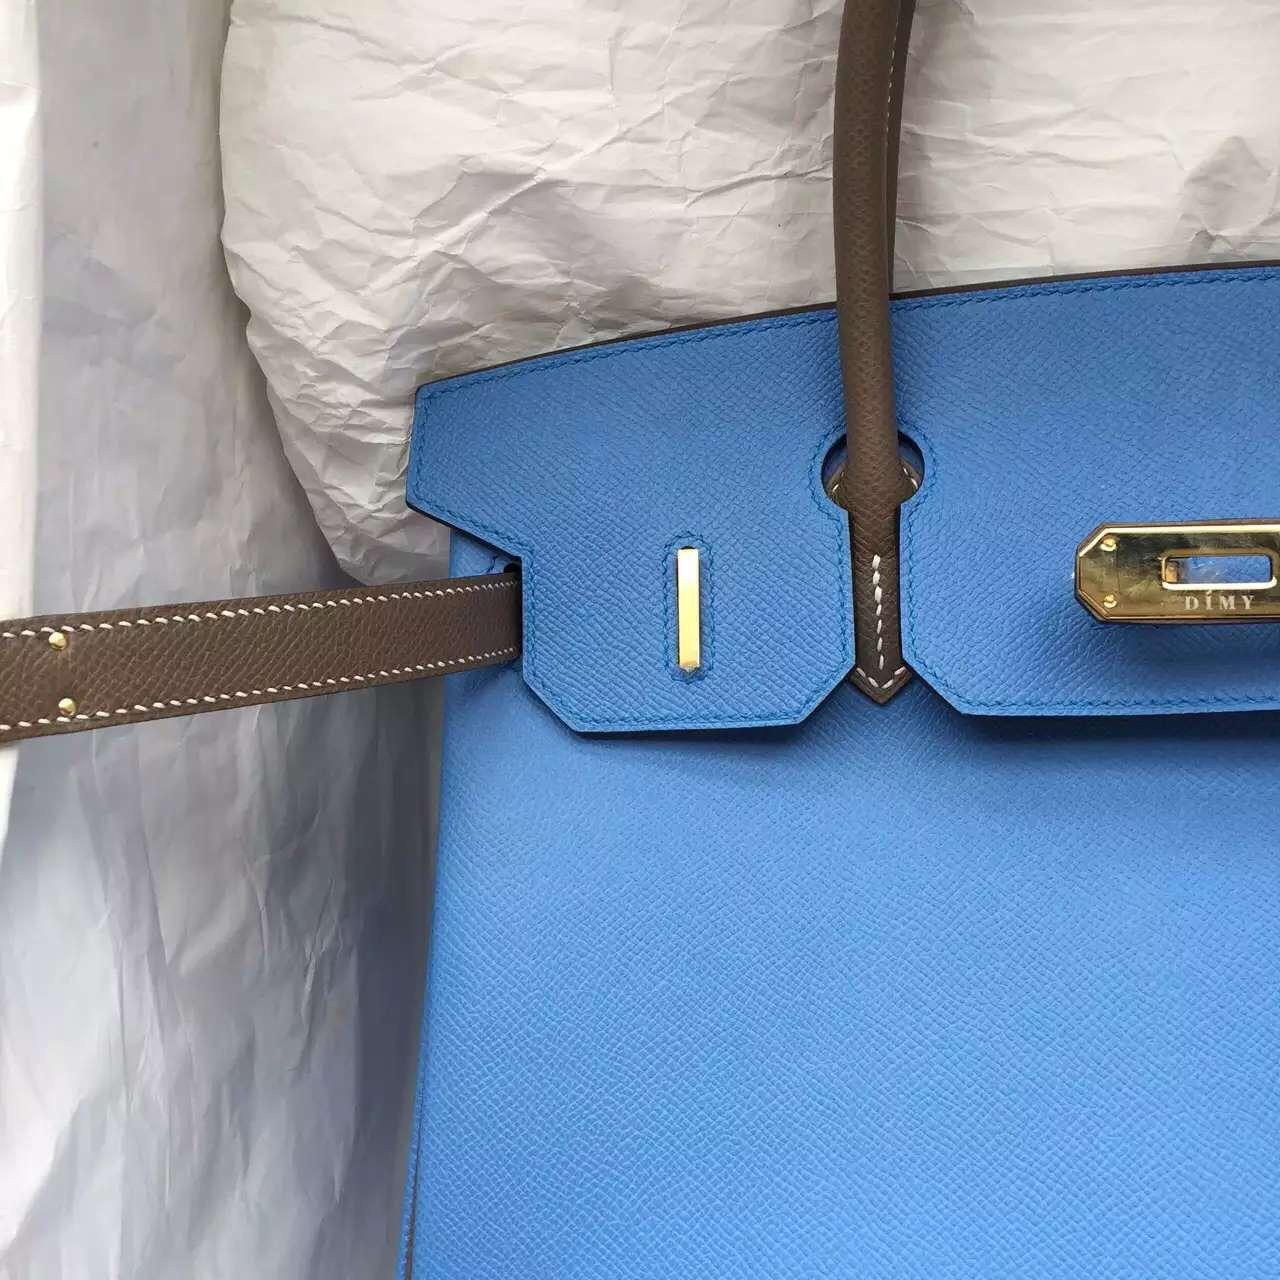 Cheap Hermes 2T Blue Paradise & Etoupe Grey Epsom Leather Birkin Bag 30CM